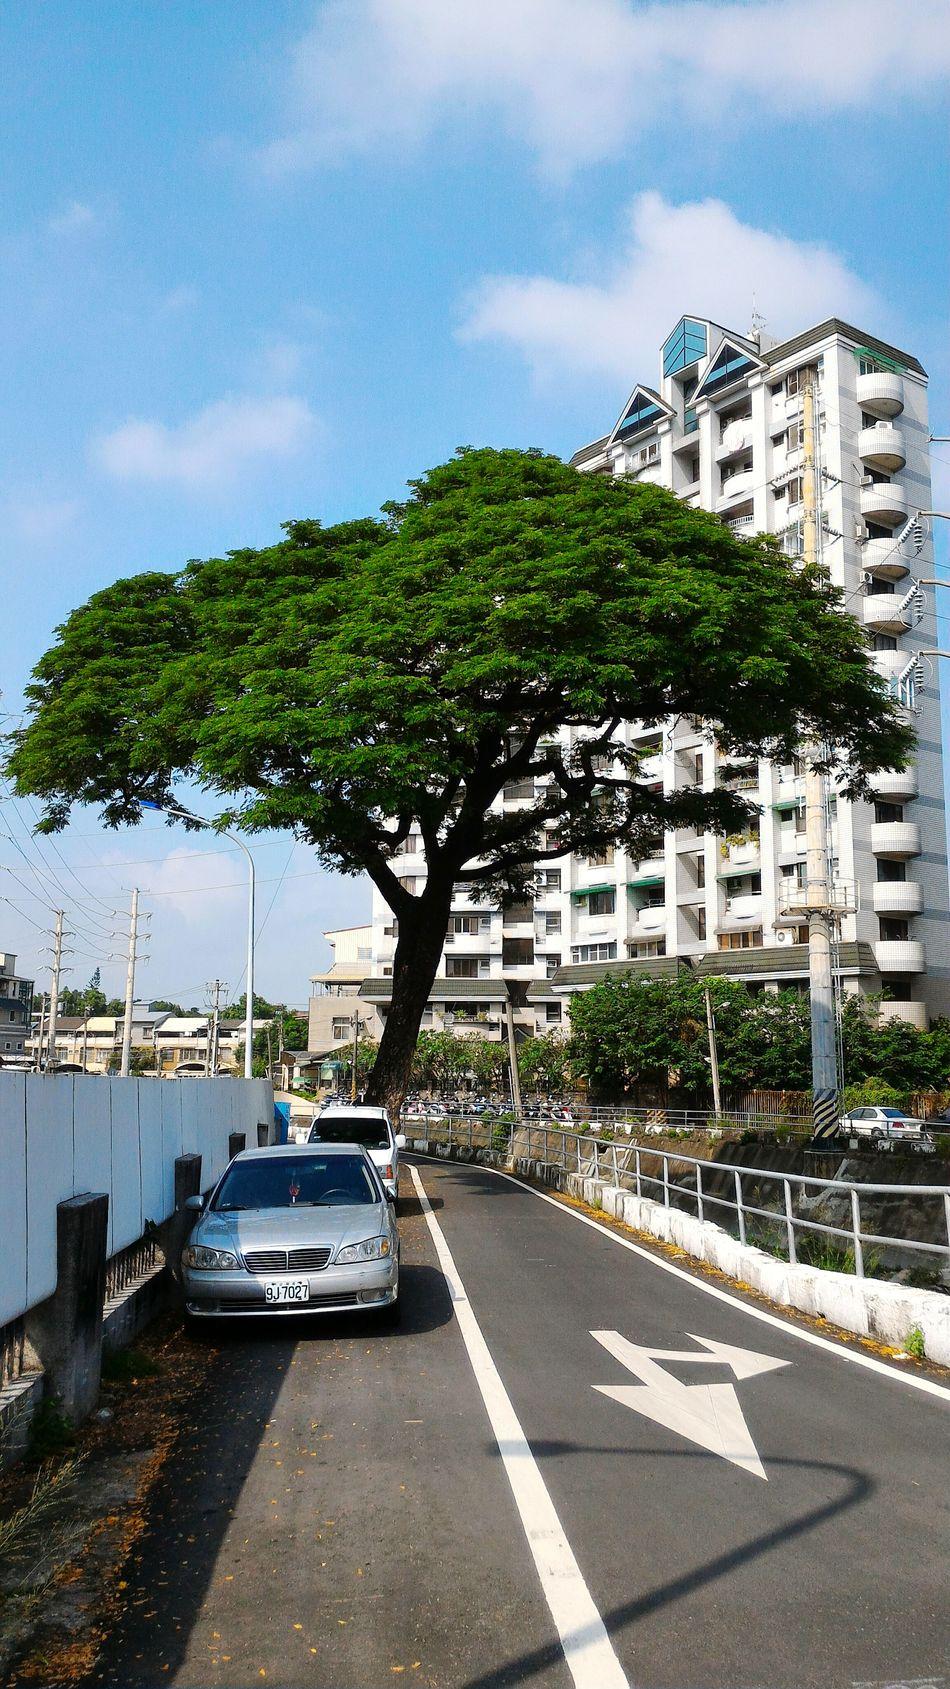 橫在馬路上的大樹 Tree Bulesky Sky And Clouds On The Road Street Photography Pingtung City Taiwan